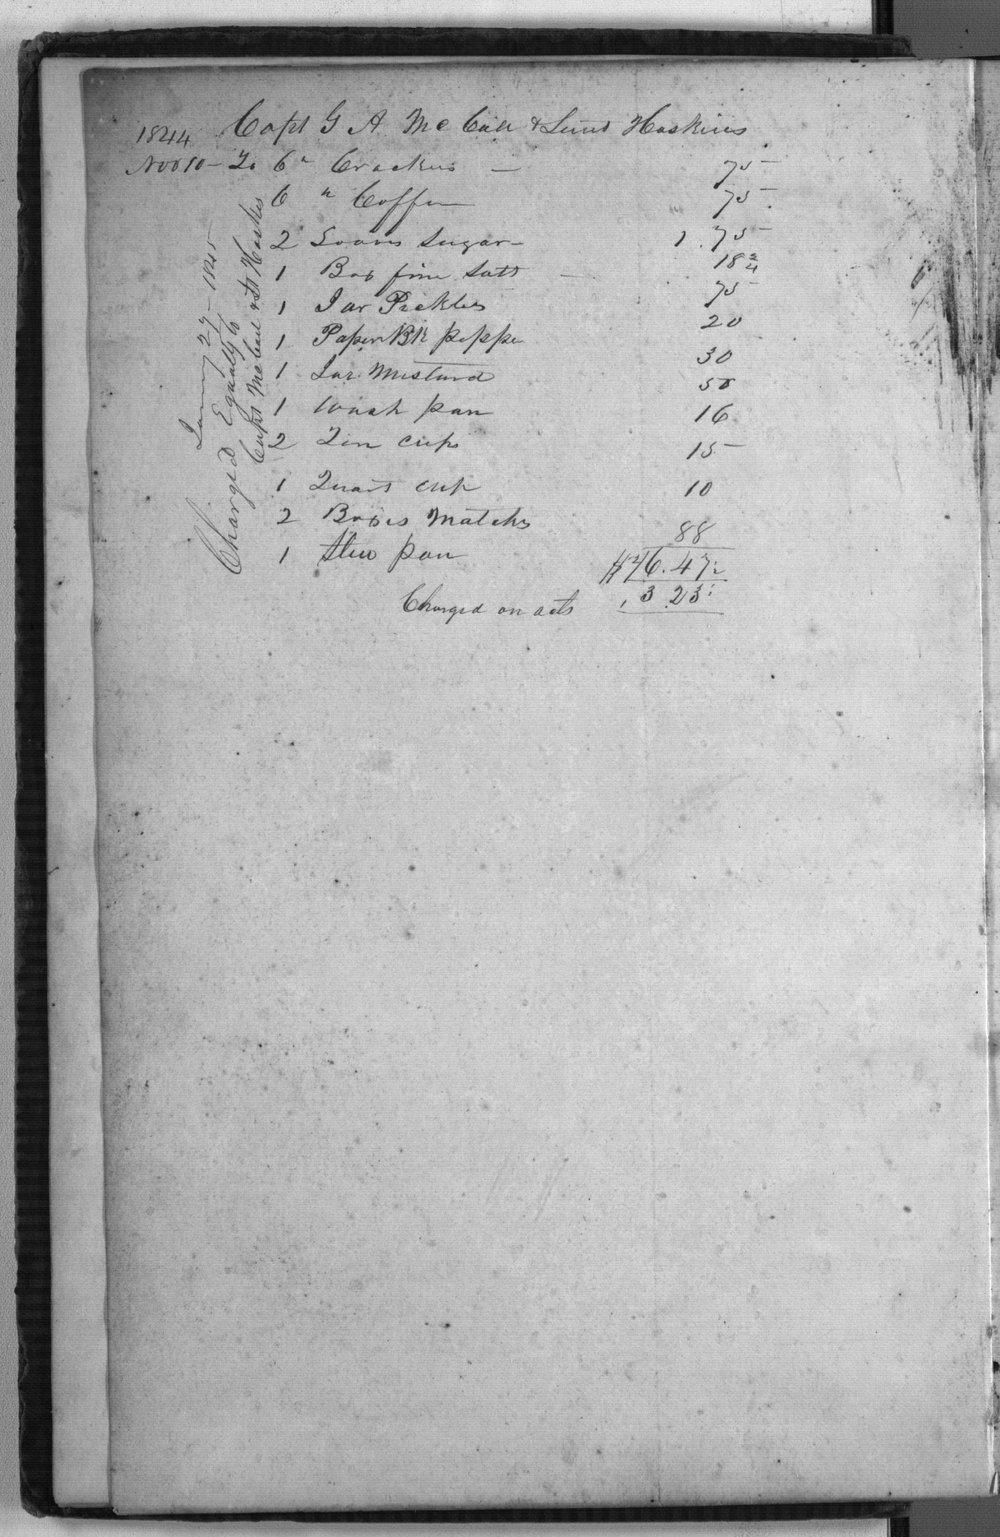 Post sutler's day book, Fort Scott - 6